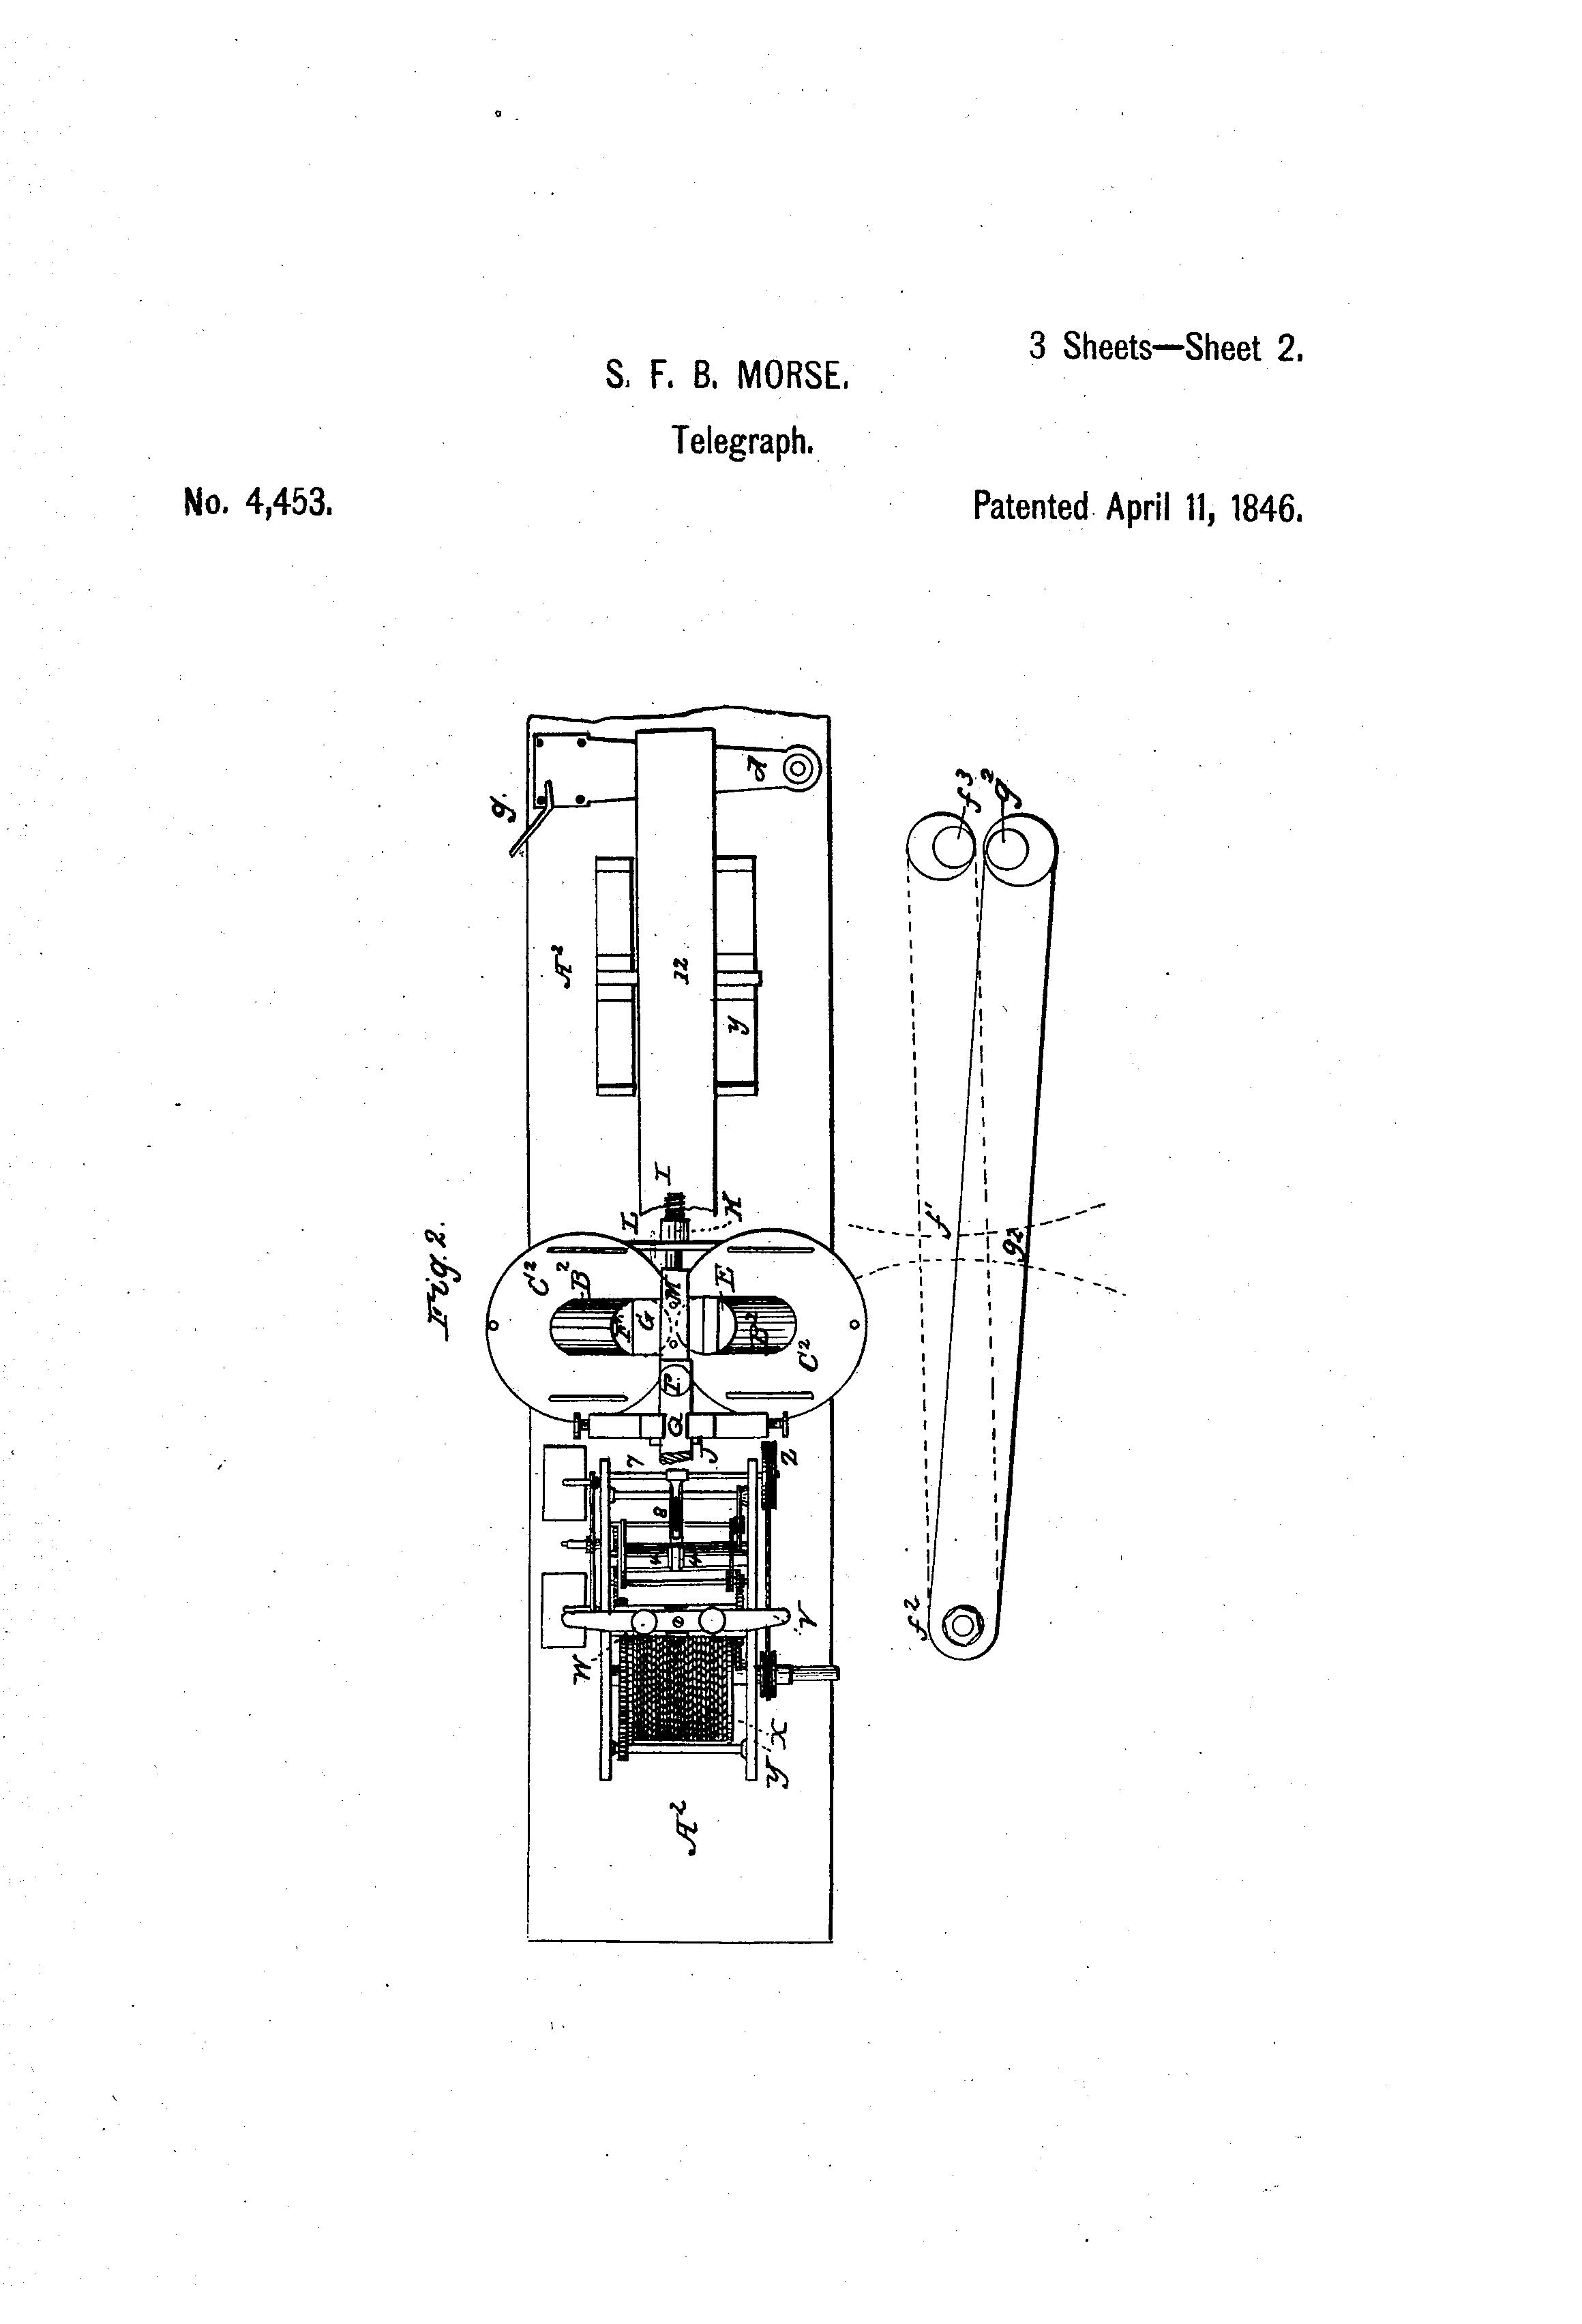 patent us4453 - improvement in electro-magnetic telegraphs